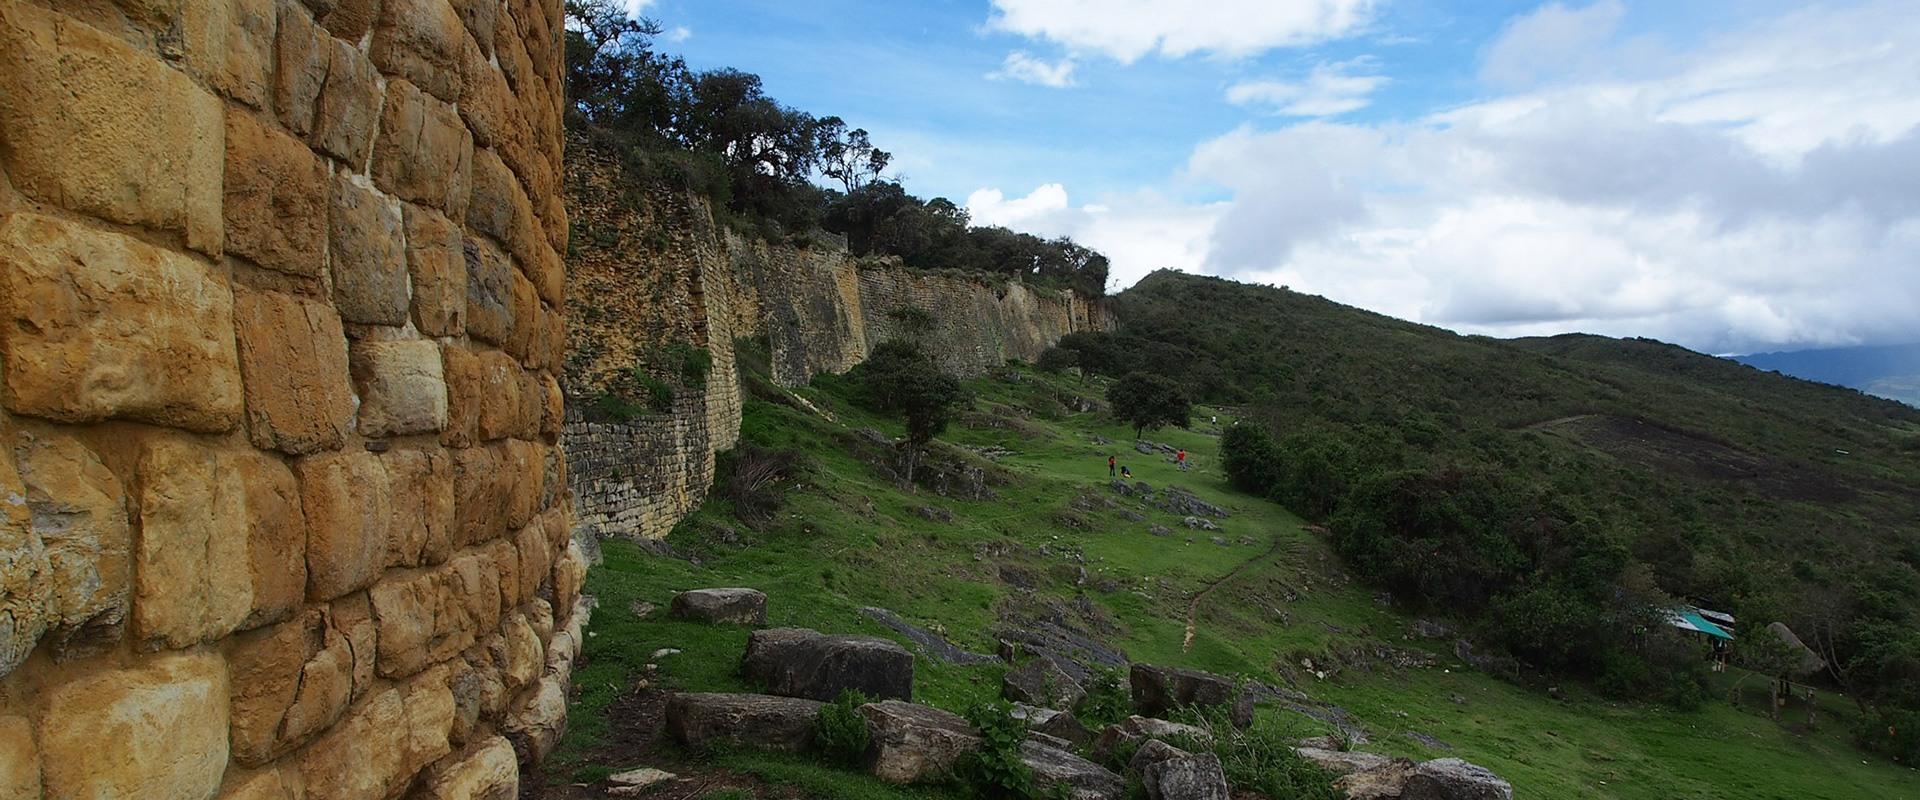 chachapoyas perou ruines vestiges